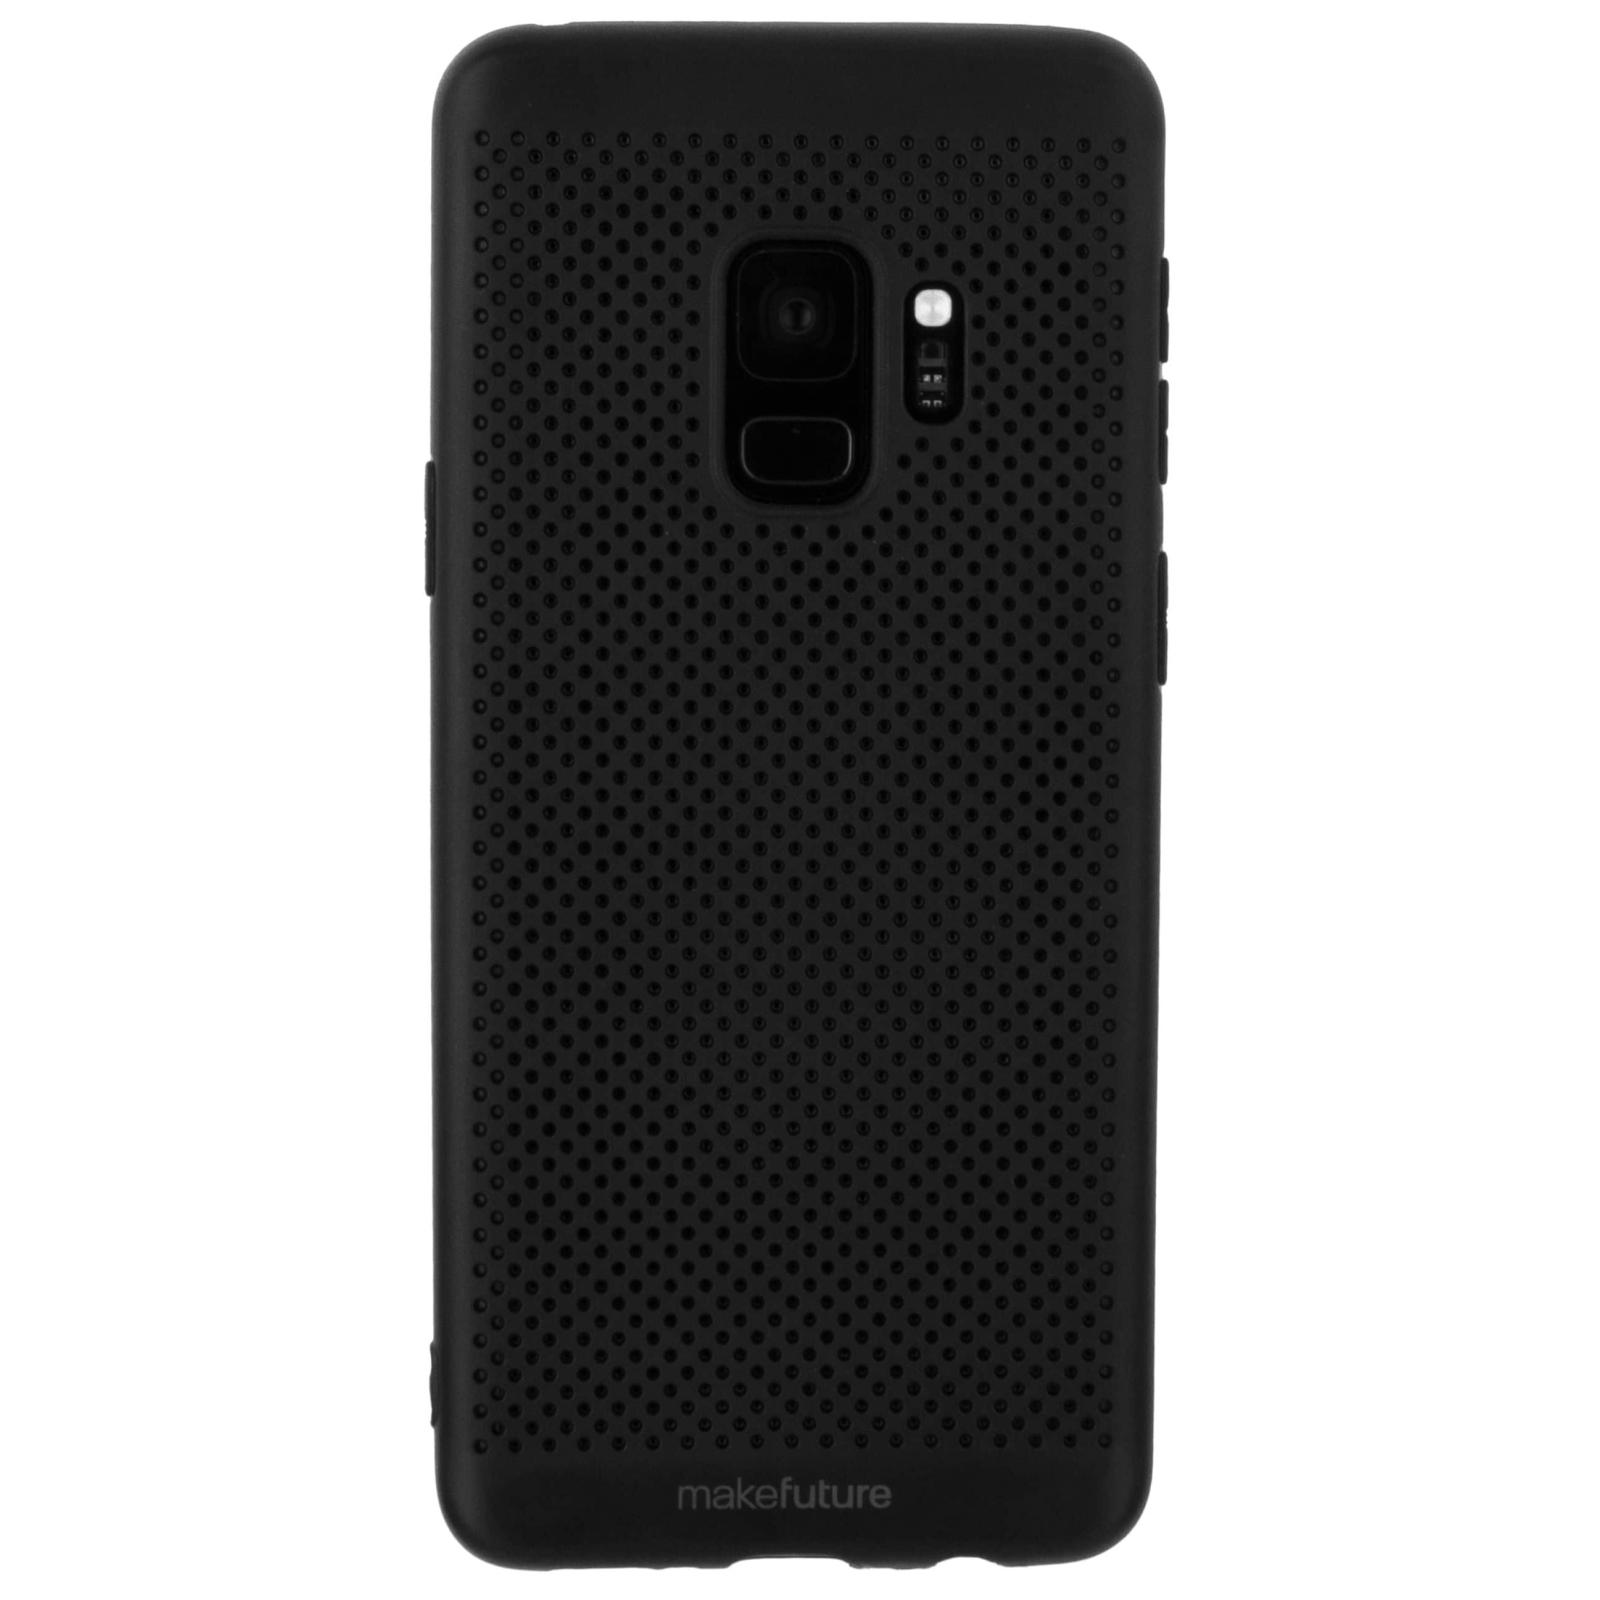 Чехол для моб. телефона MakeFuture Moon Case (TPU) для Samsung S9 Black (MCM-SS9BK)